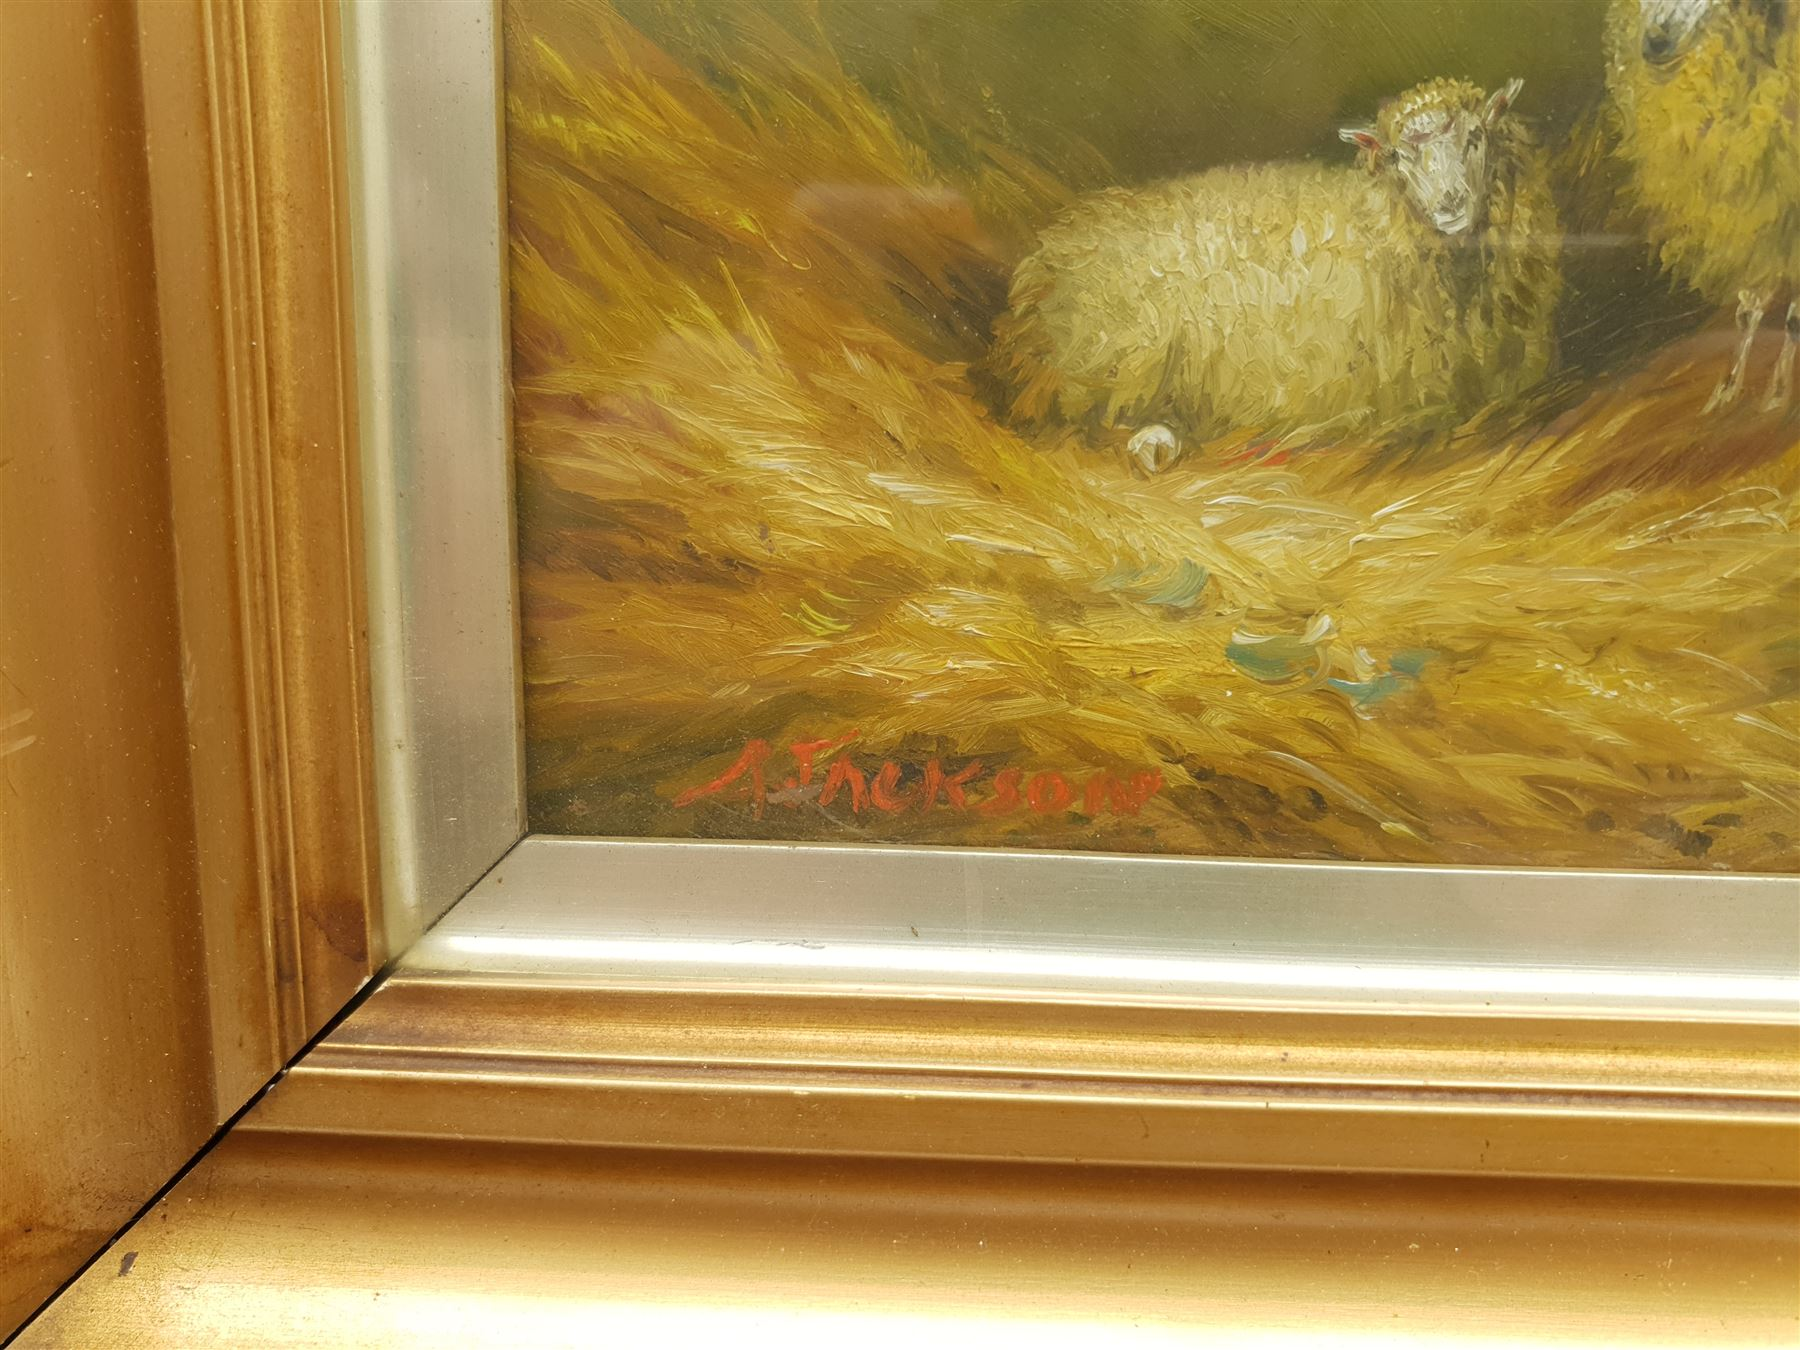 Arthur Jackson (British fl.1885-1910): Sheep in a Barn - Image 4 of 7